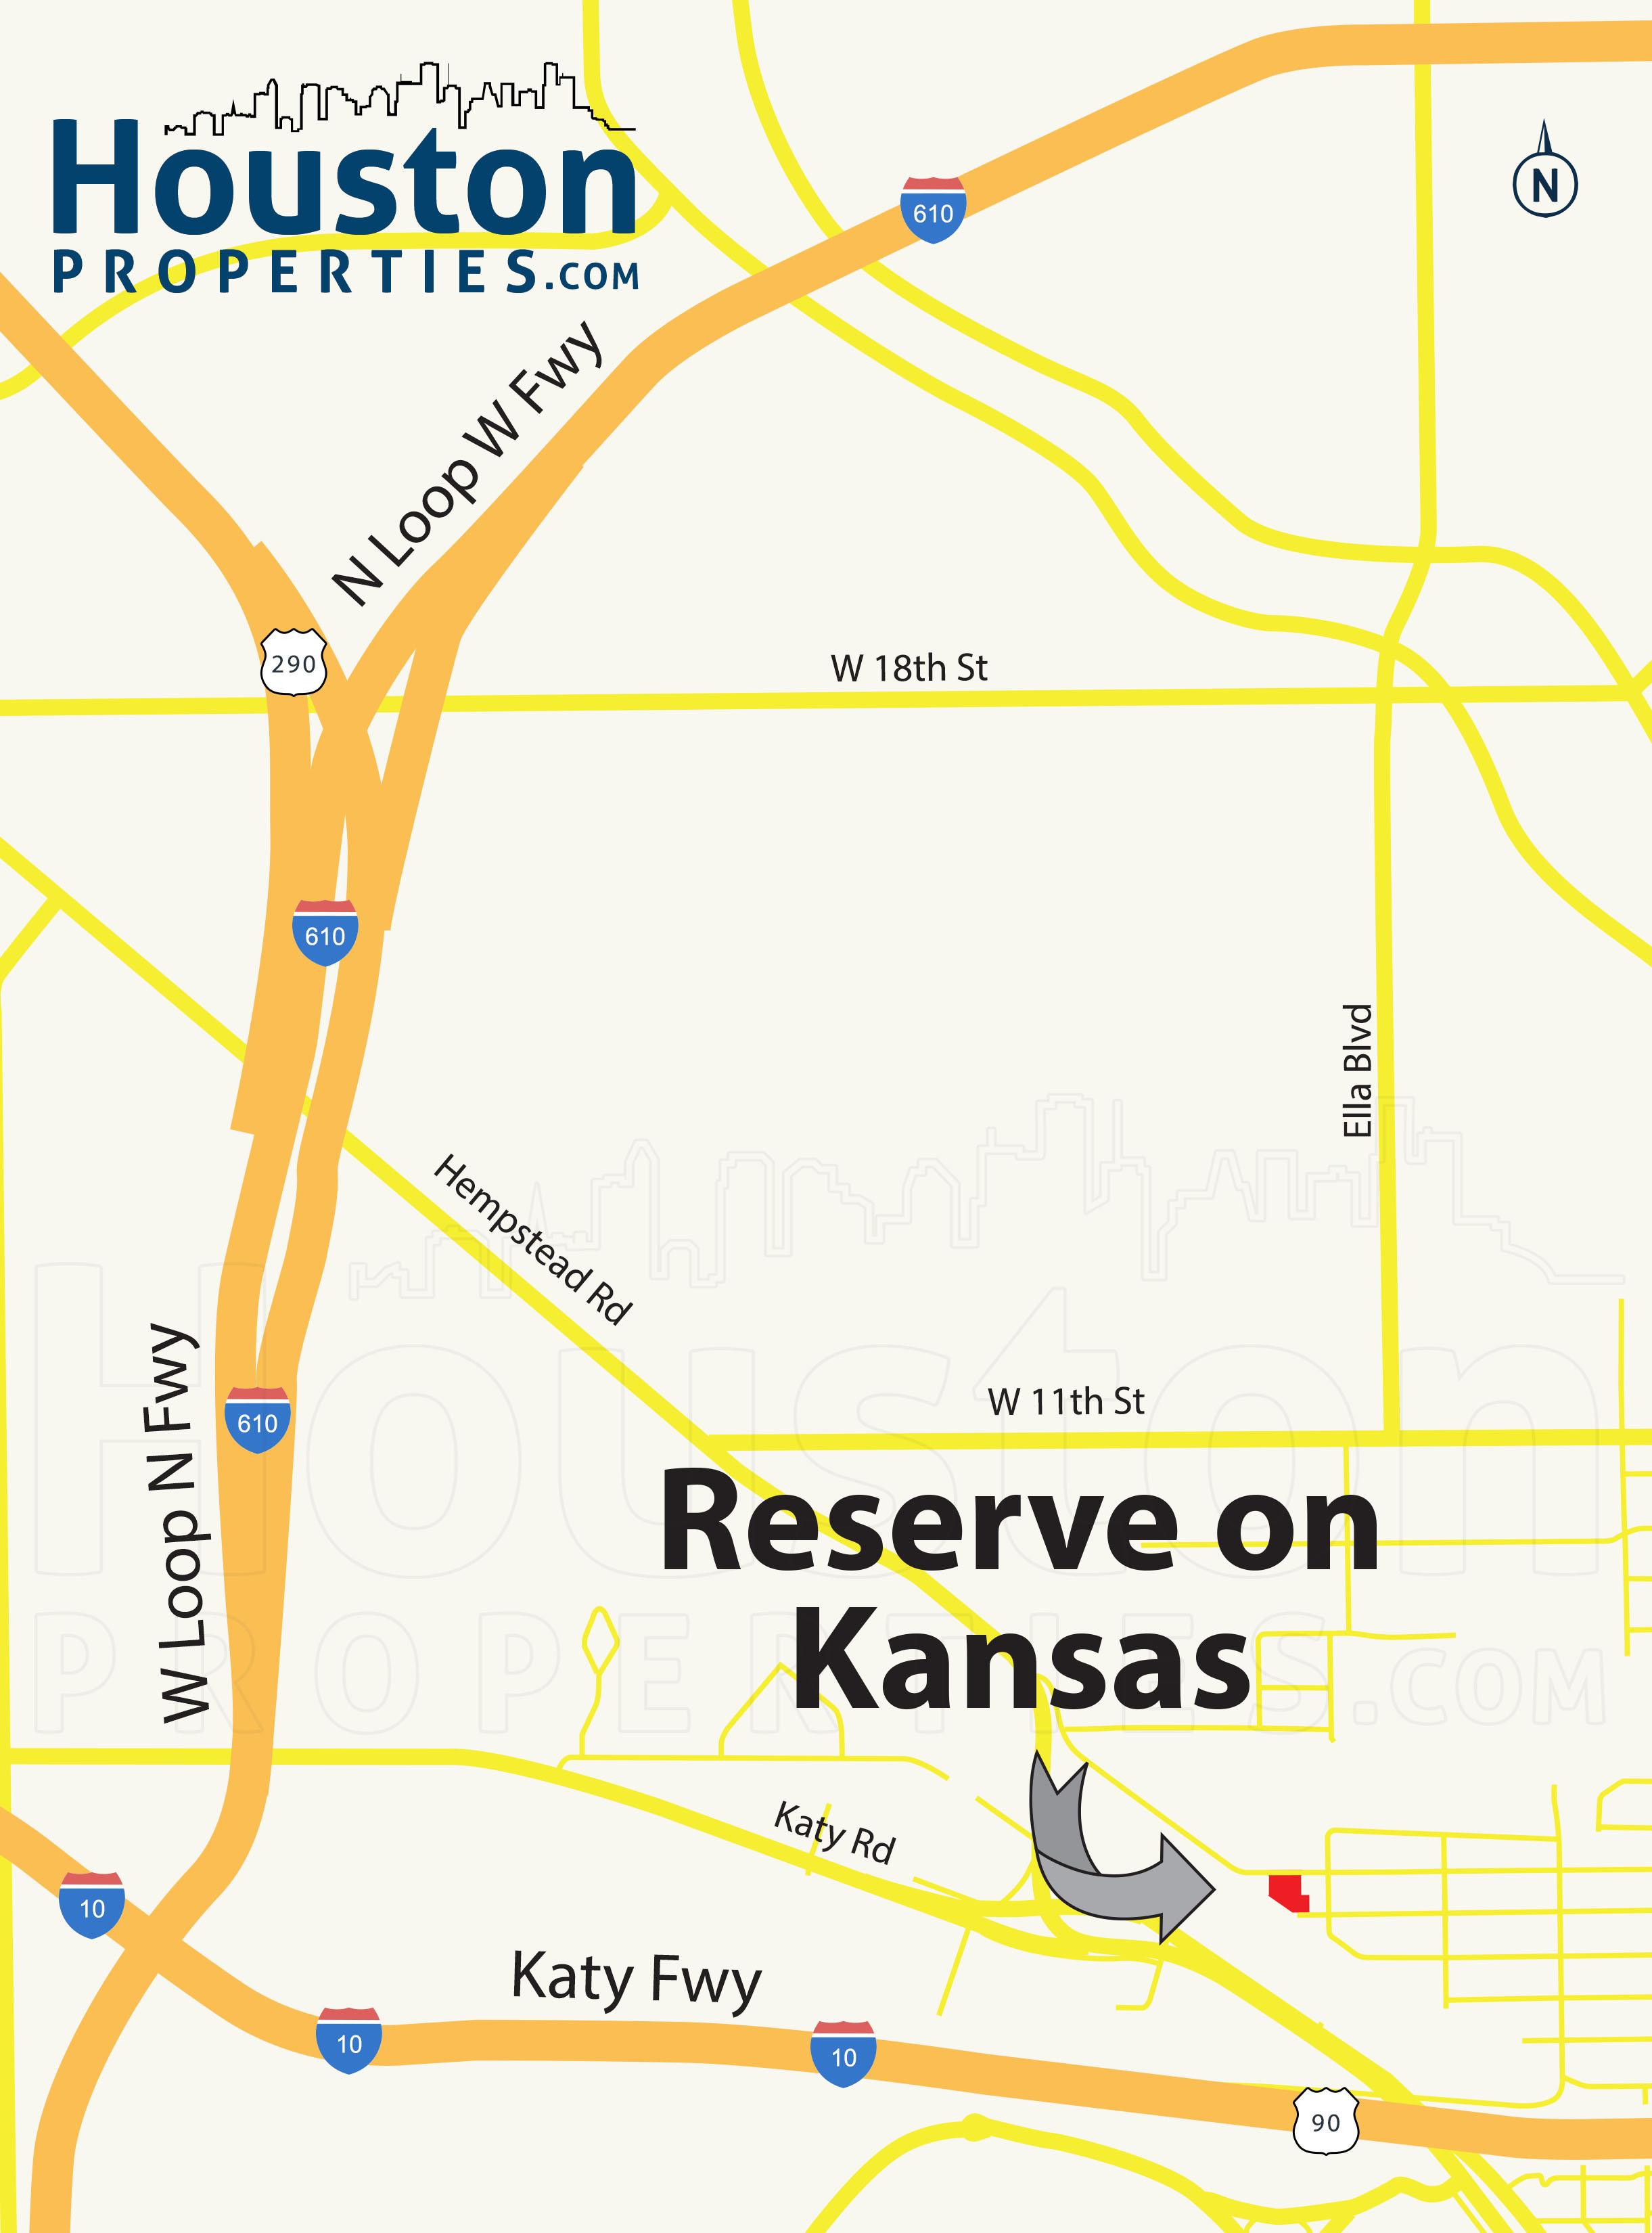 Reserve on Kansas Houston map